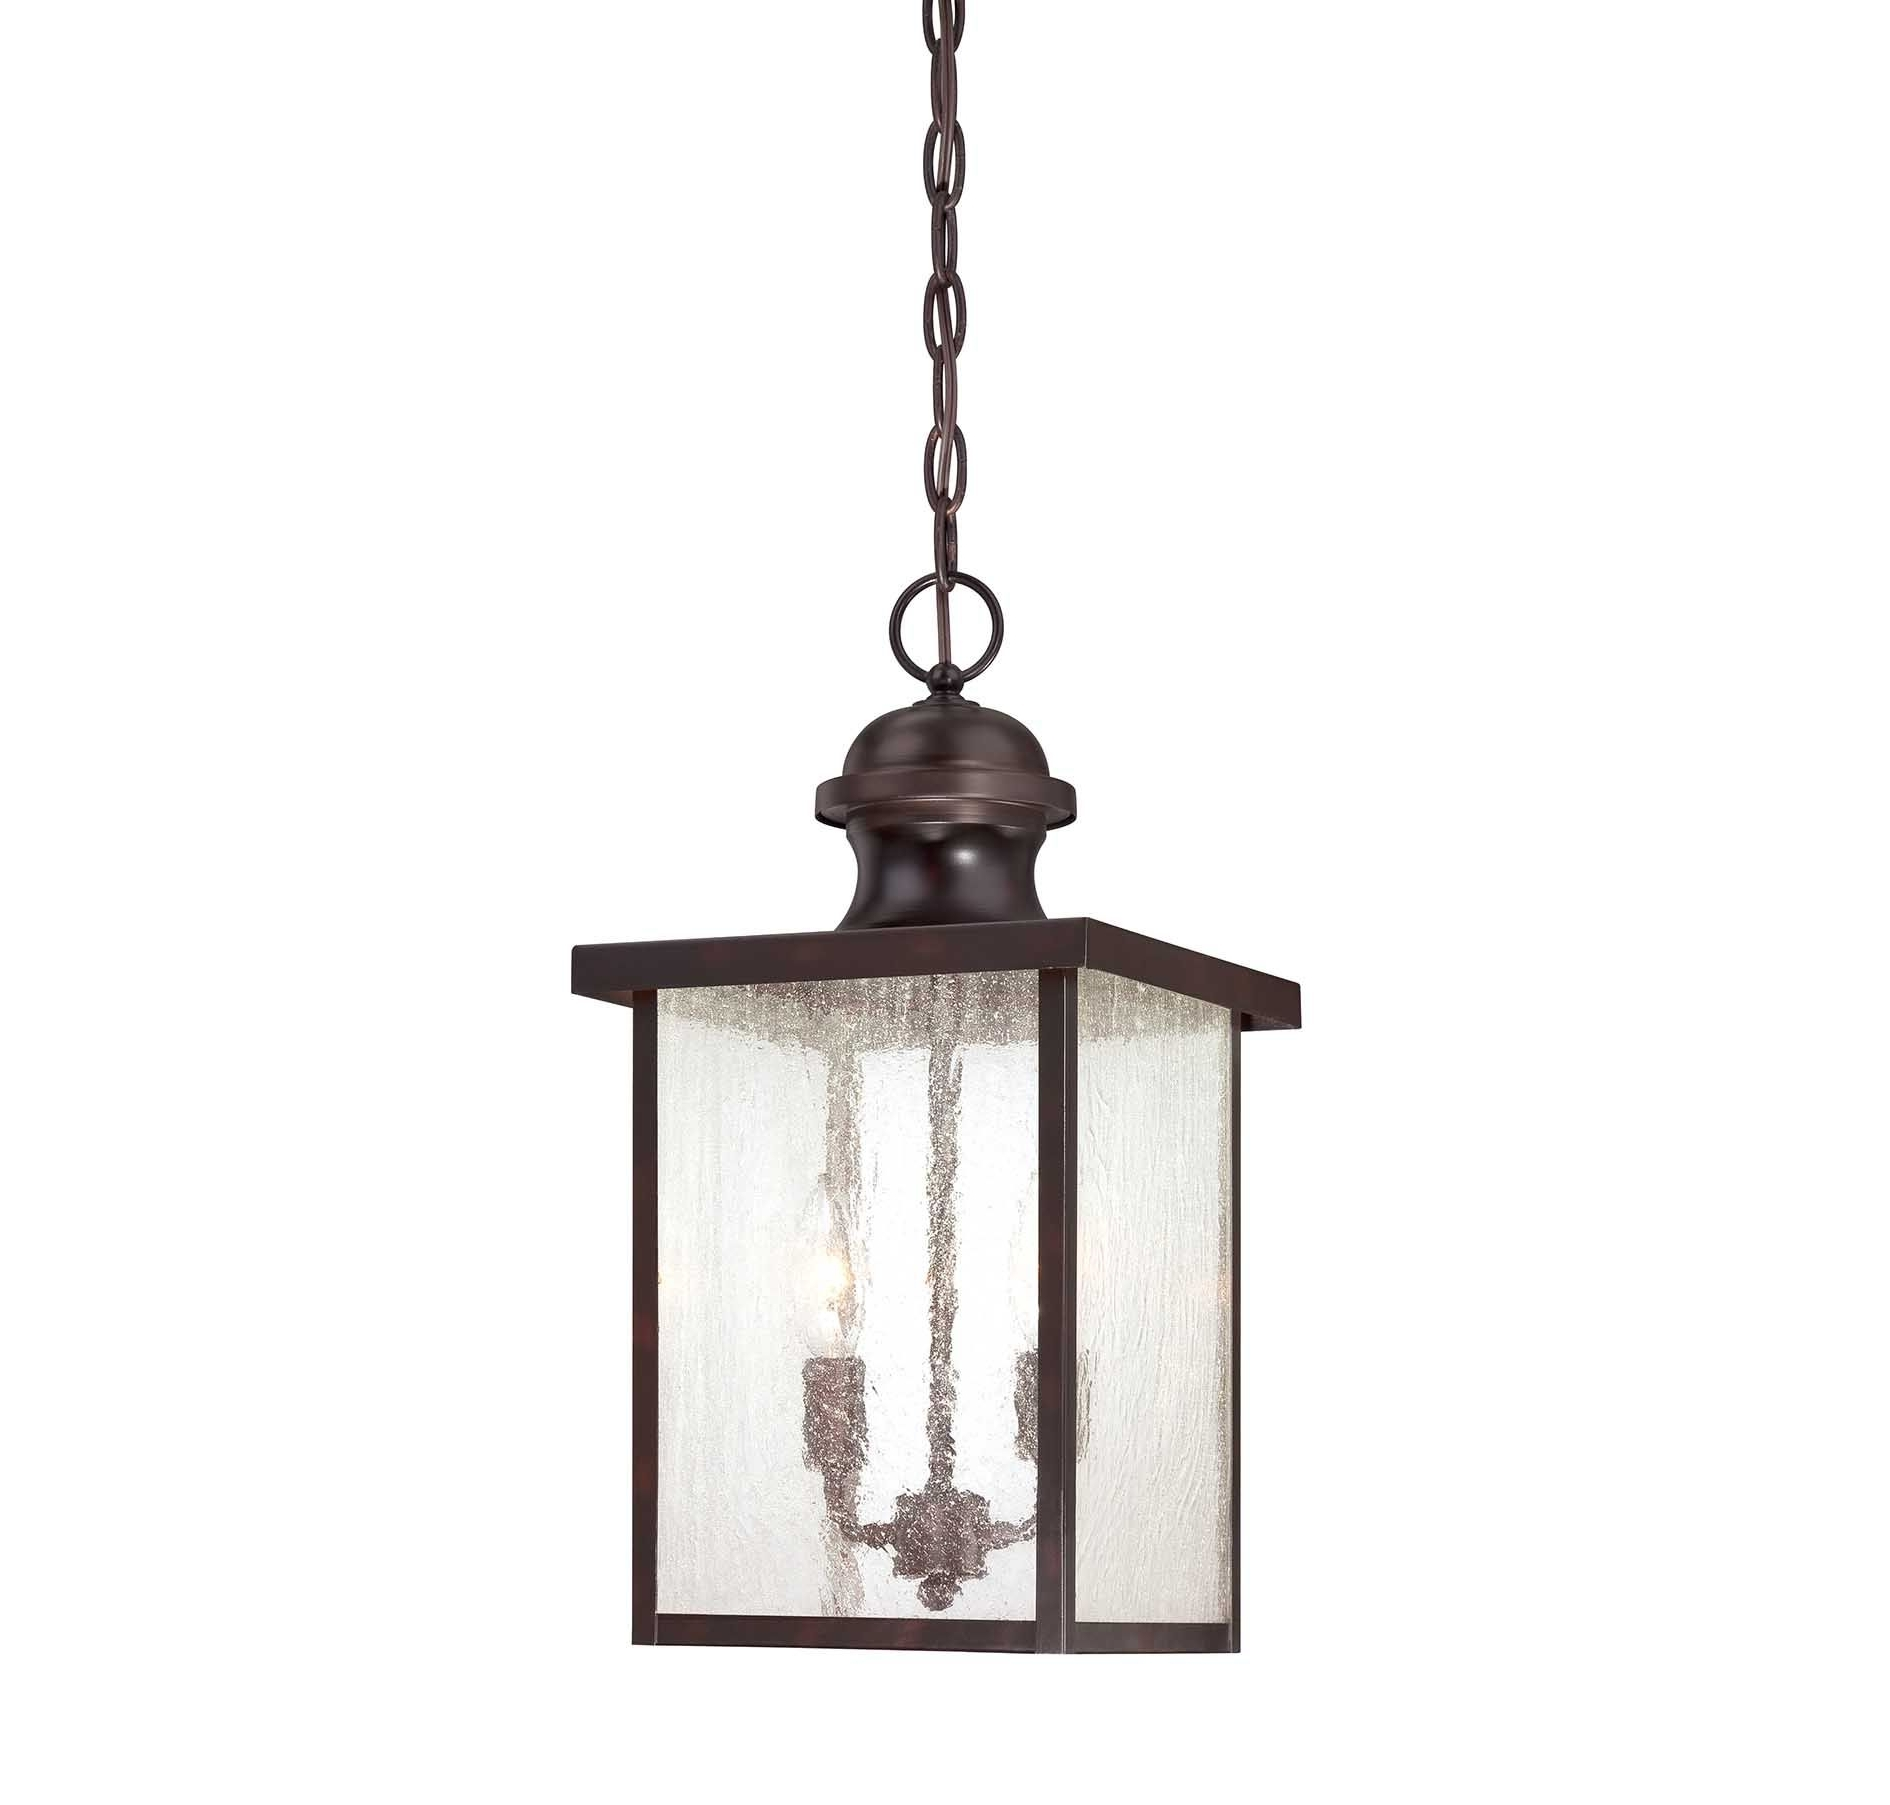 Wayfair Outdoor Hanging Lighting Fixtures With Current Newberry Hanging Exterior Lantern :: Outdoor Lighting :: Products (View 18 of 20)